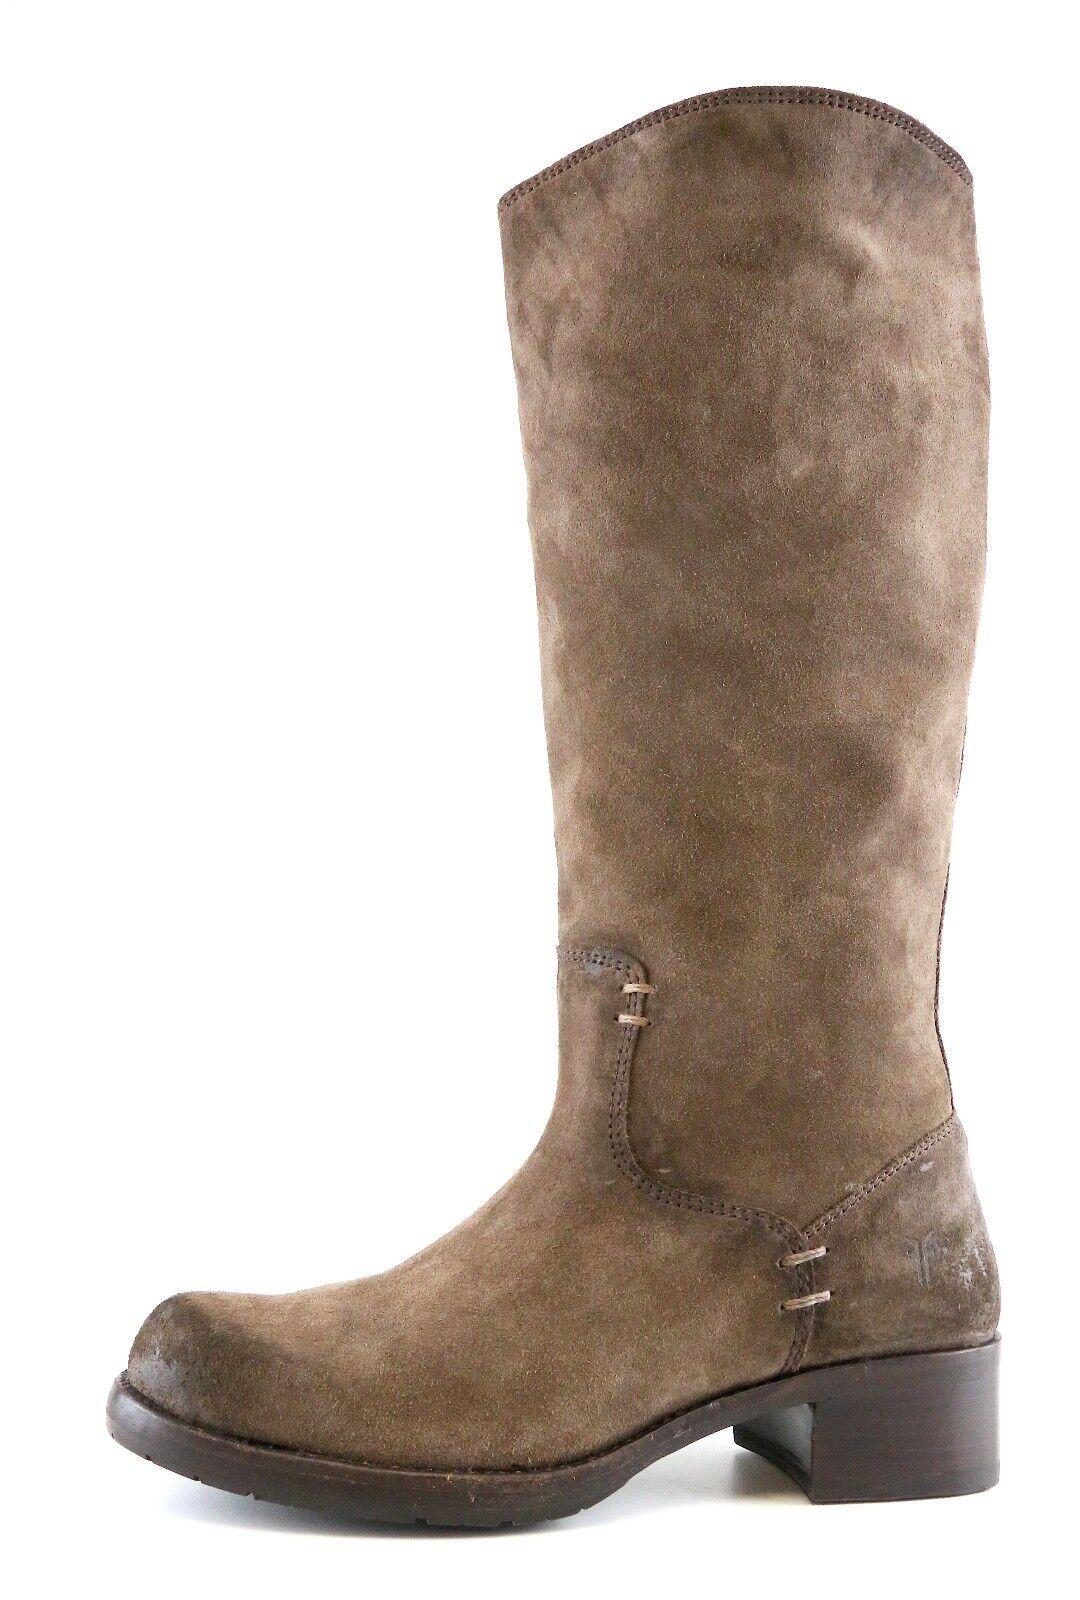 FRYE Elena Pull On Suede Boots Brown Women Sz 8.5 B 6811 *